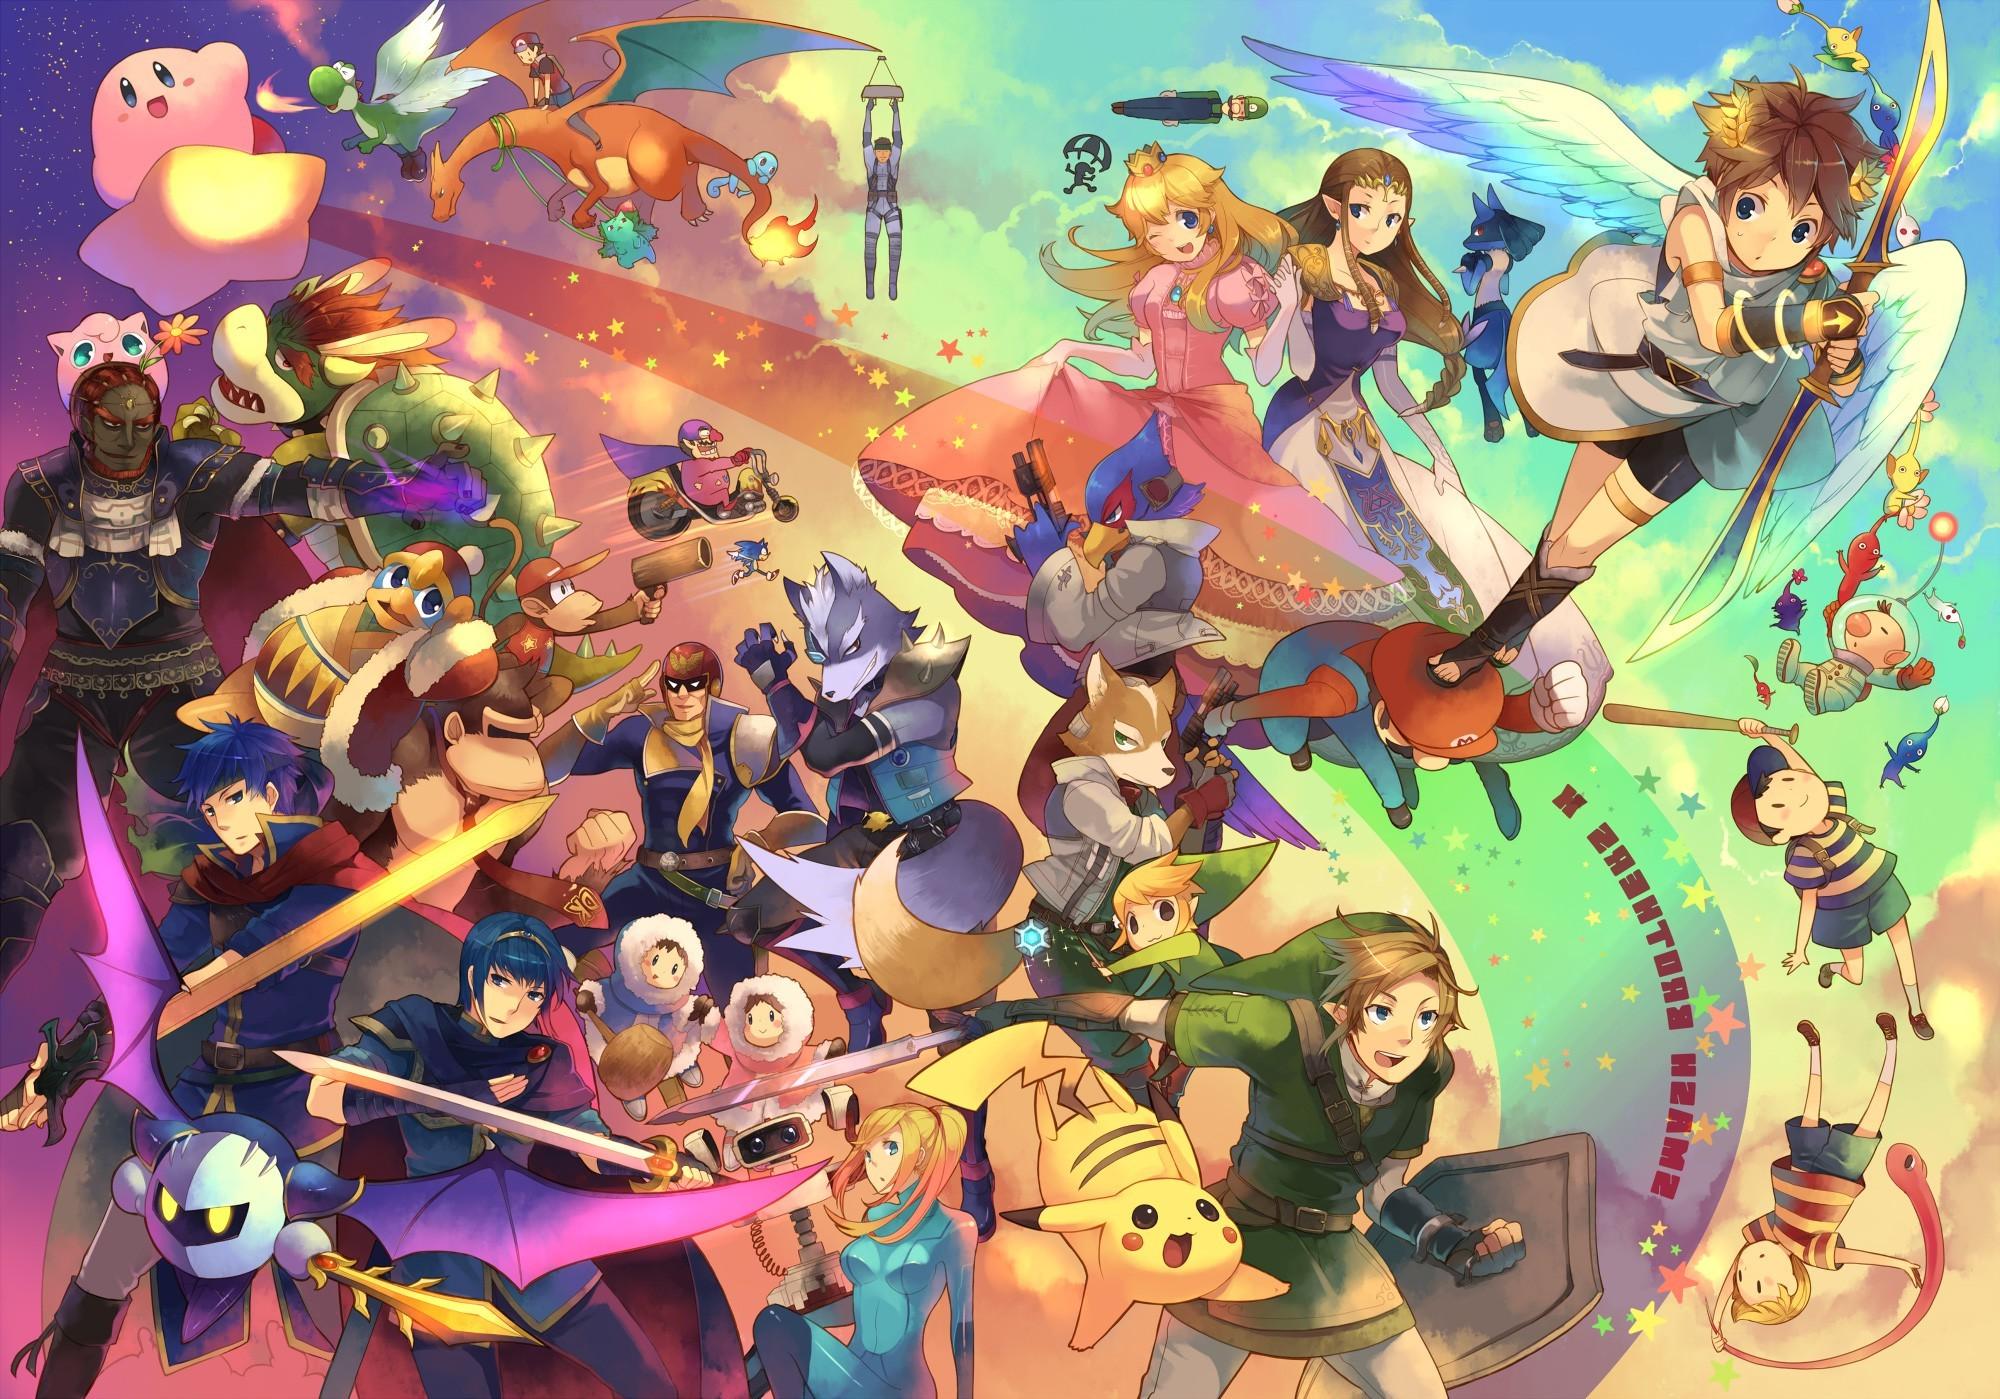 Cool Wallpaper Logo Super Smash Bro - 2000x1399-px-bowser-Falco-Fox-McCloud-Link-Marth-Nintendo-Pikachu-Princess-Peach-Samus-Aran-Super-Smash-Brothers-video-games-Zelda-1062662  Pic_194491.jpg